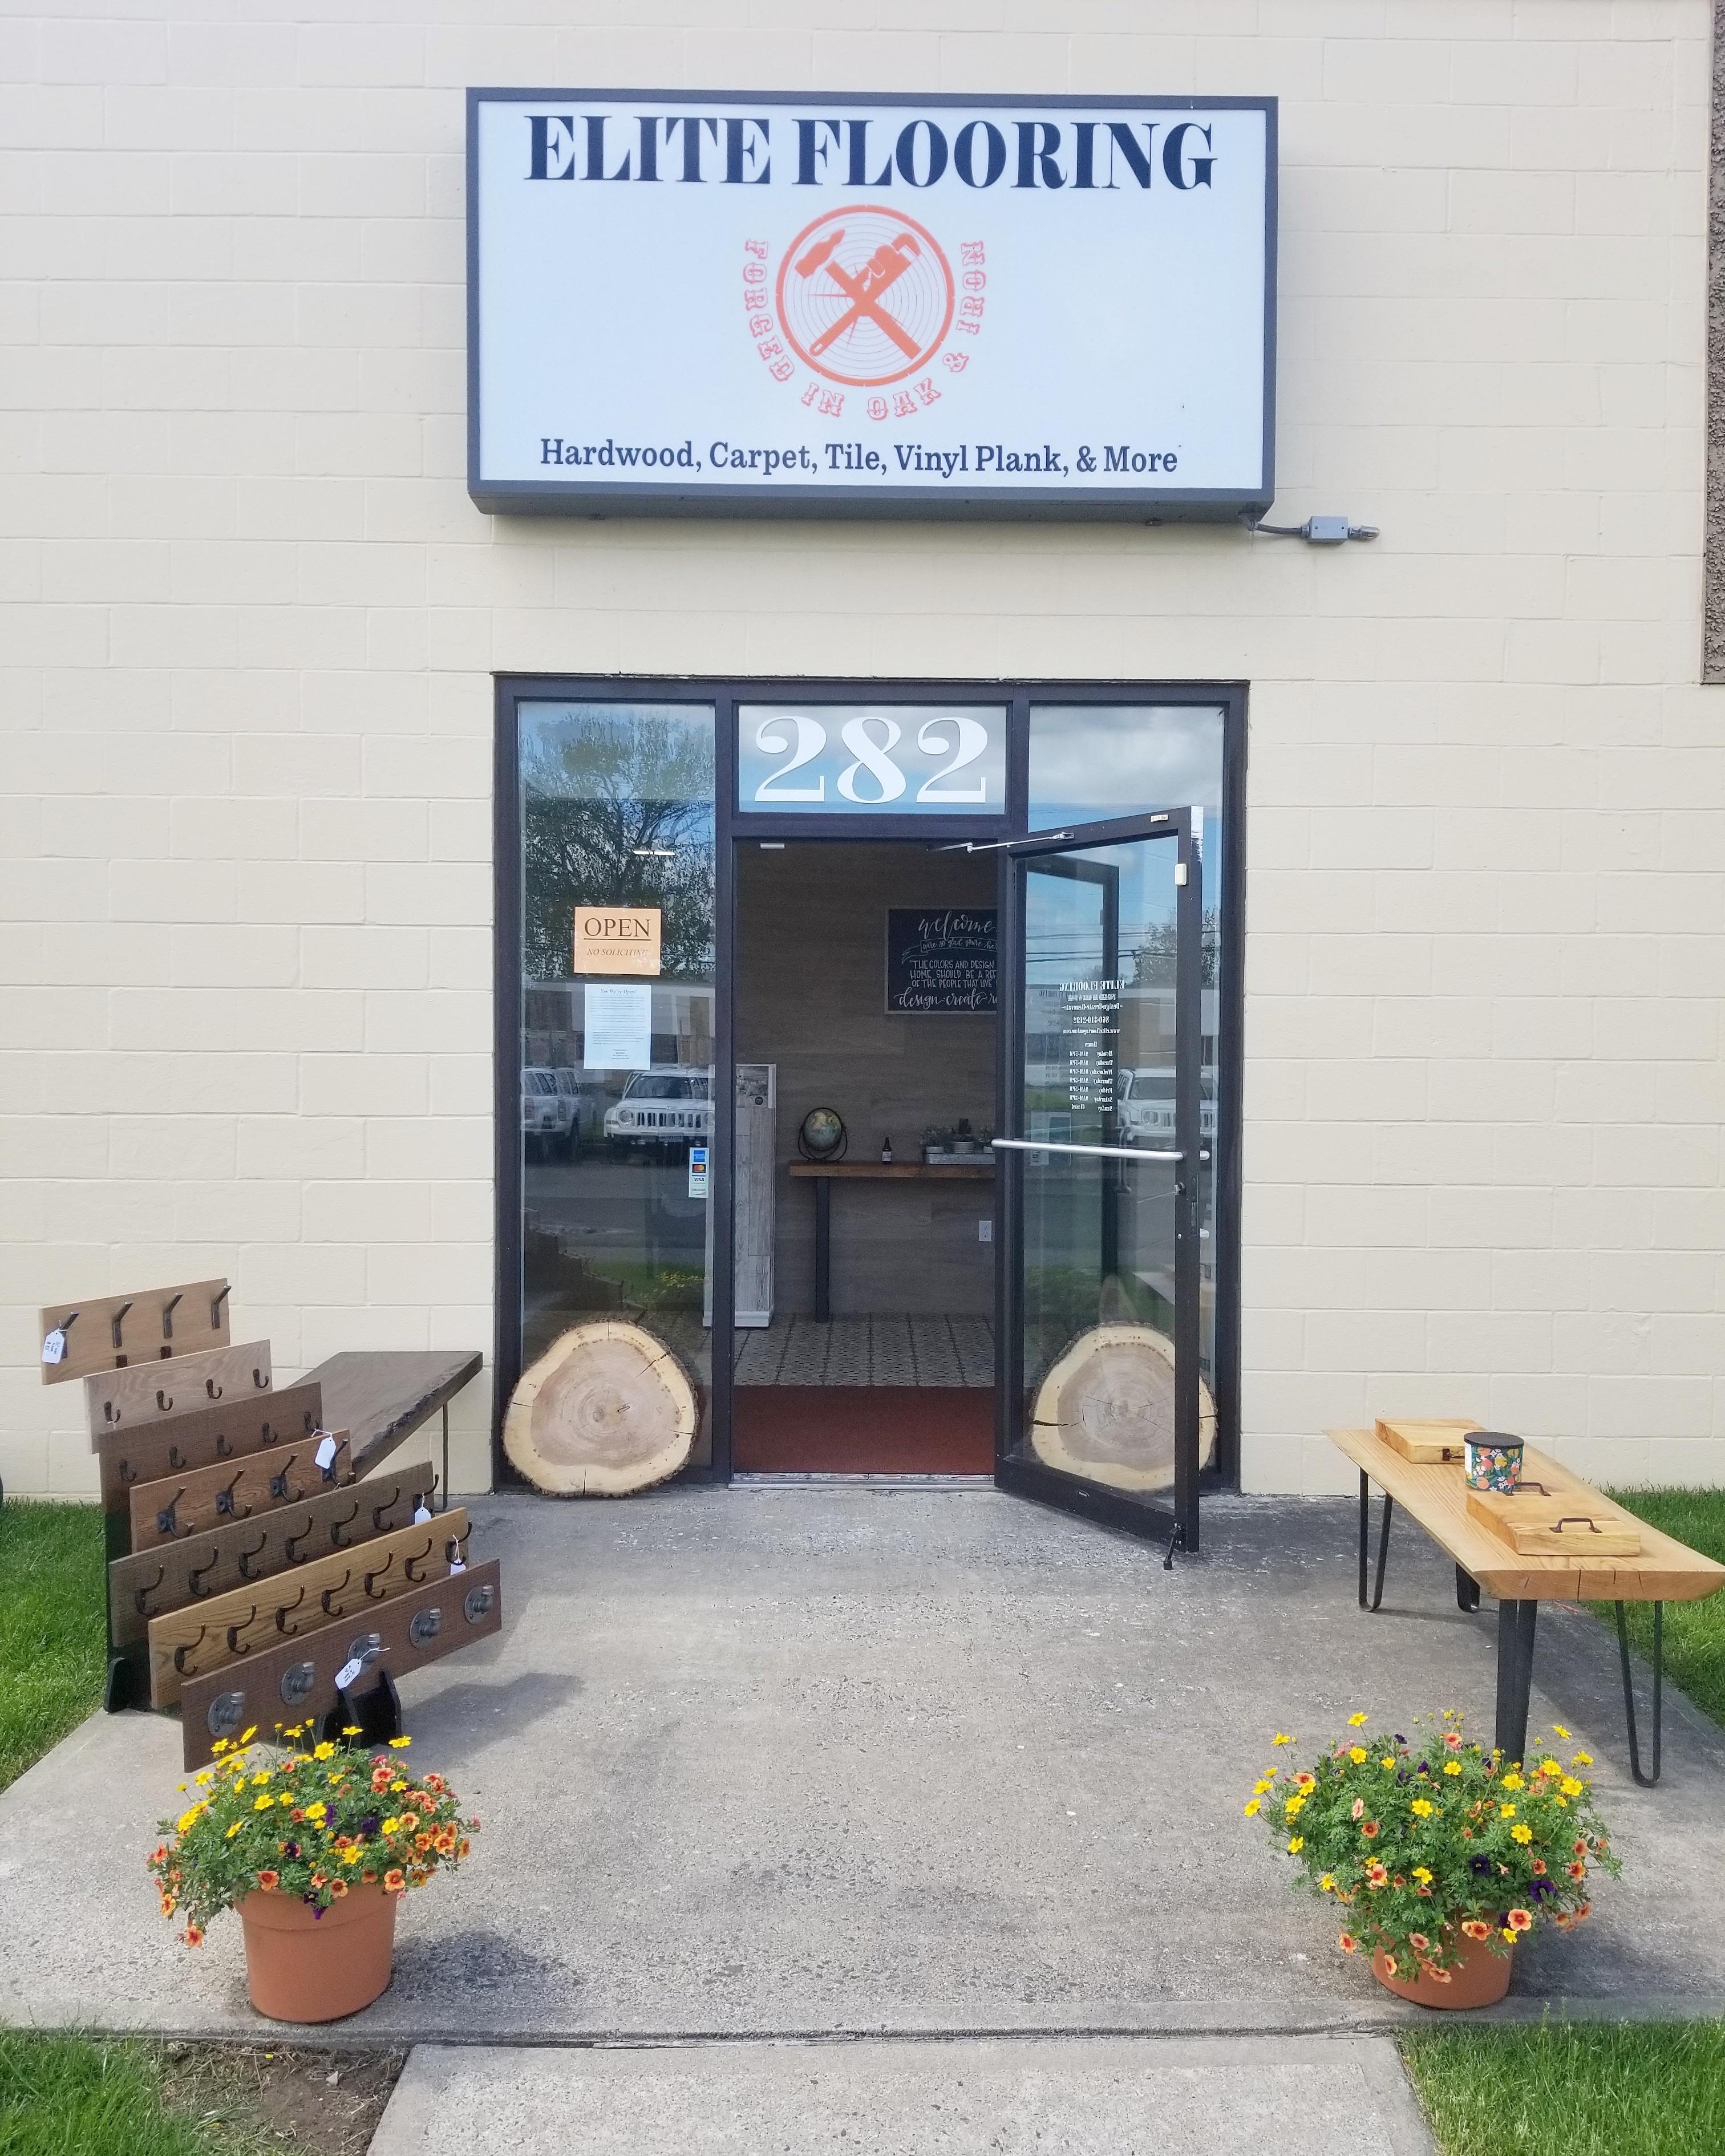 Elite Flooring Specialist - 282 Murphy Rd, Hartford, CT 06114